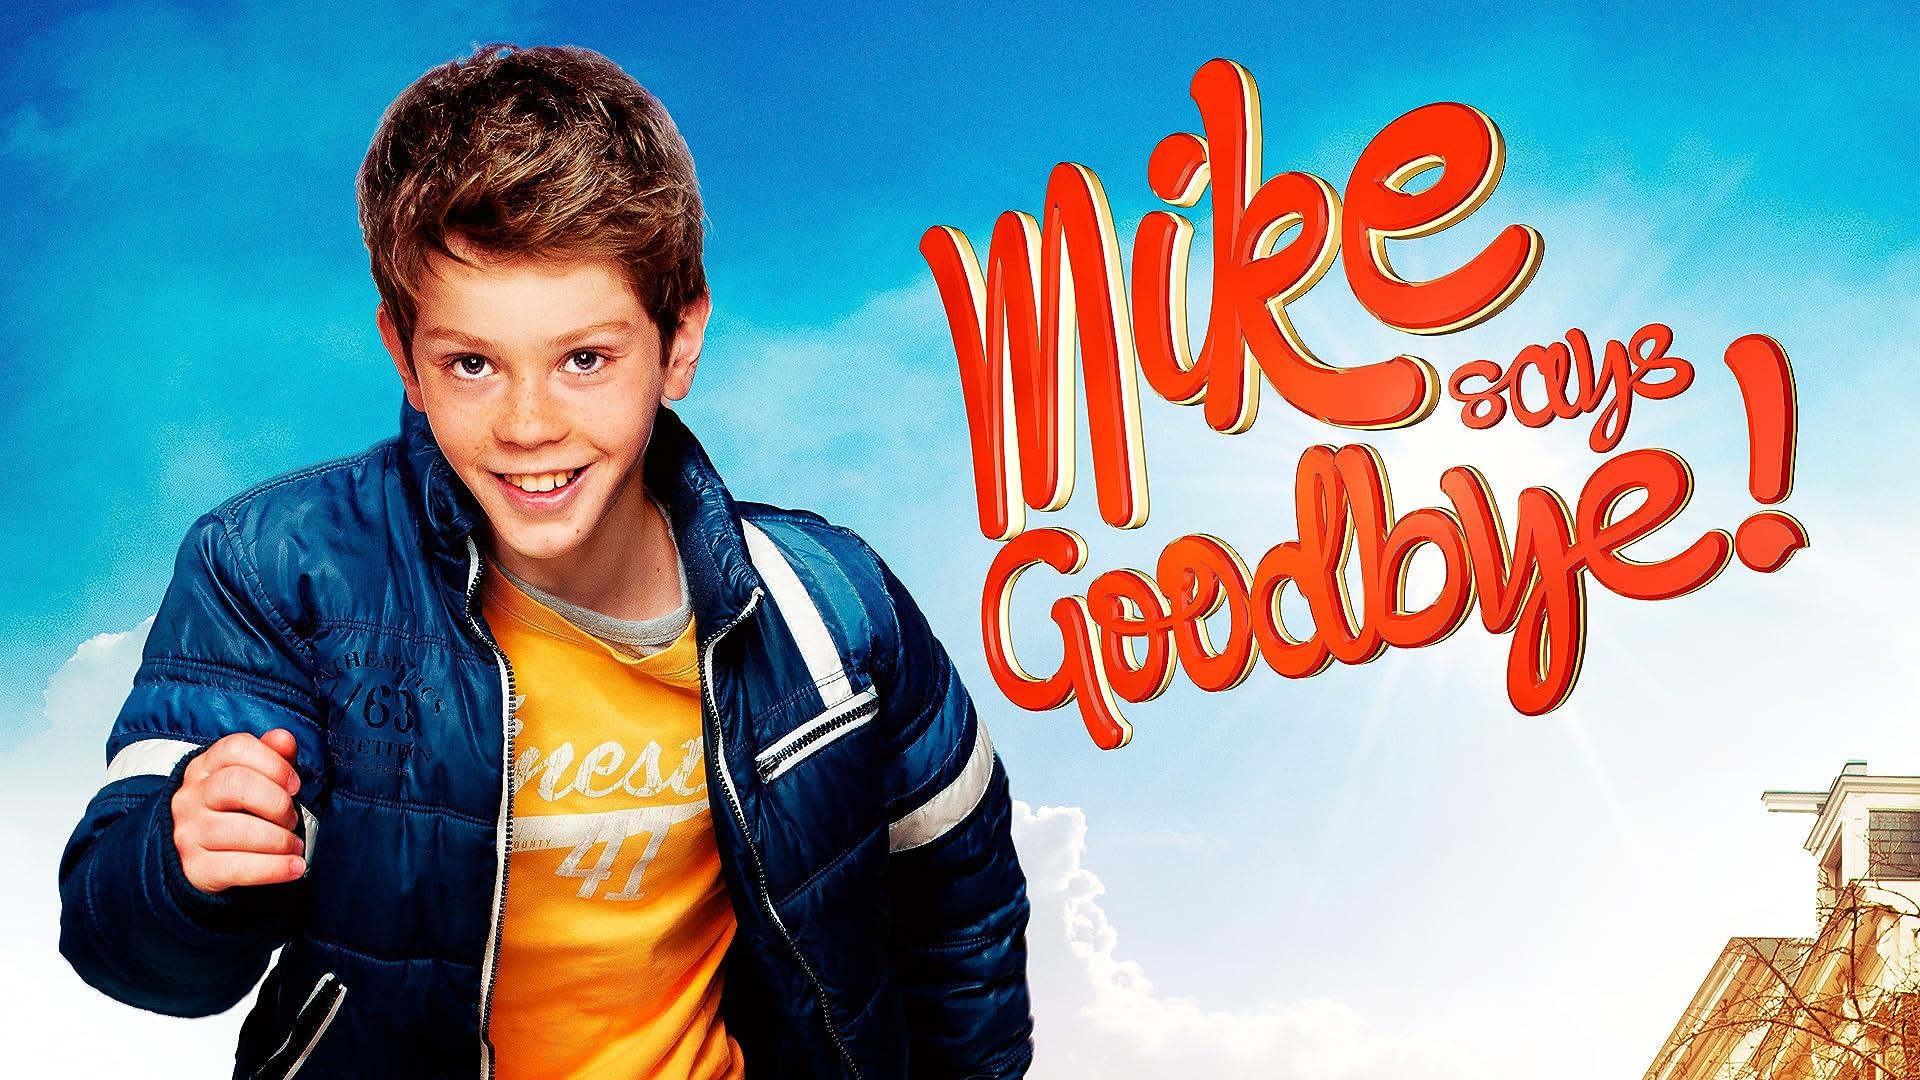 Mike says Goodbye!